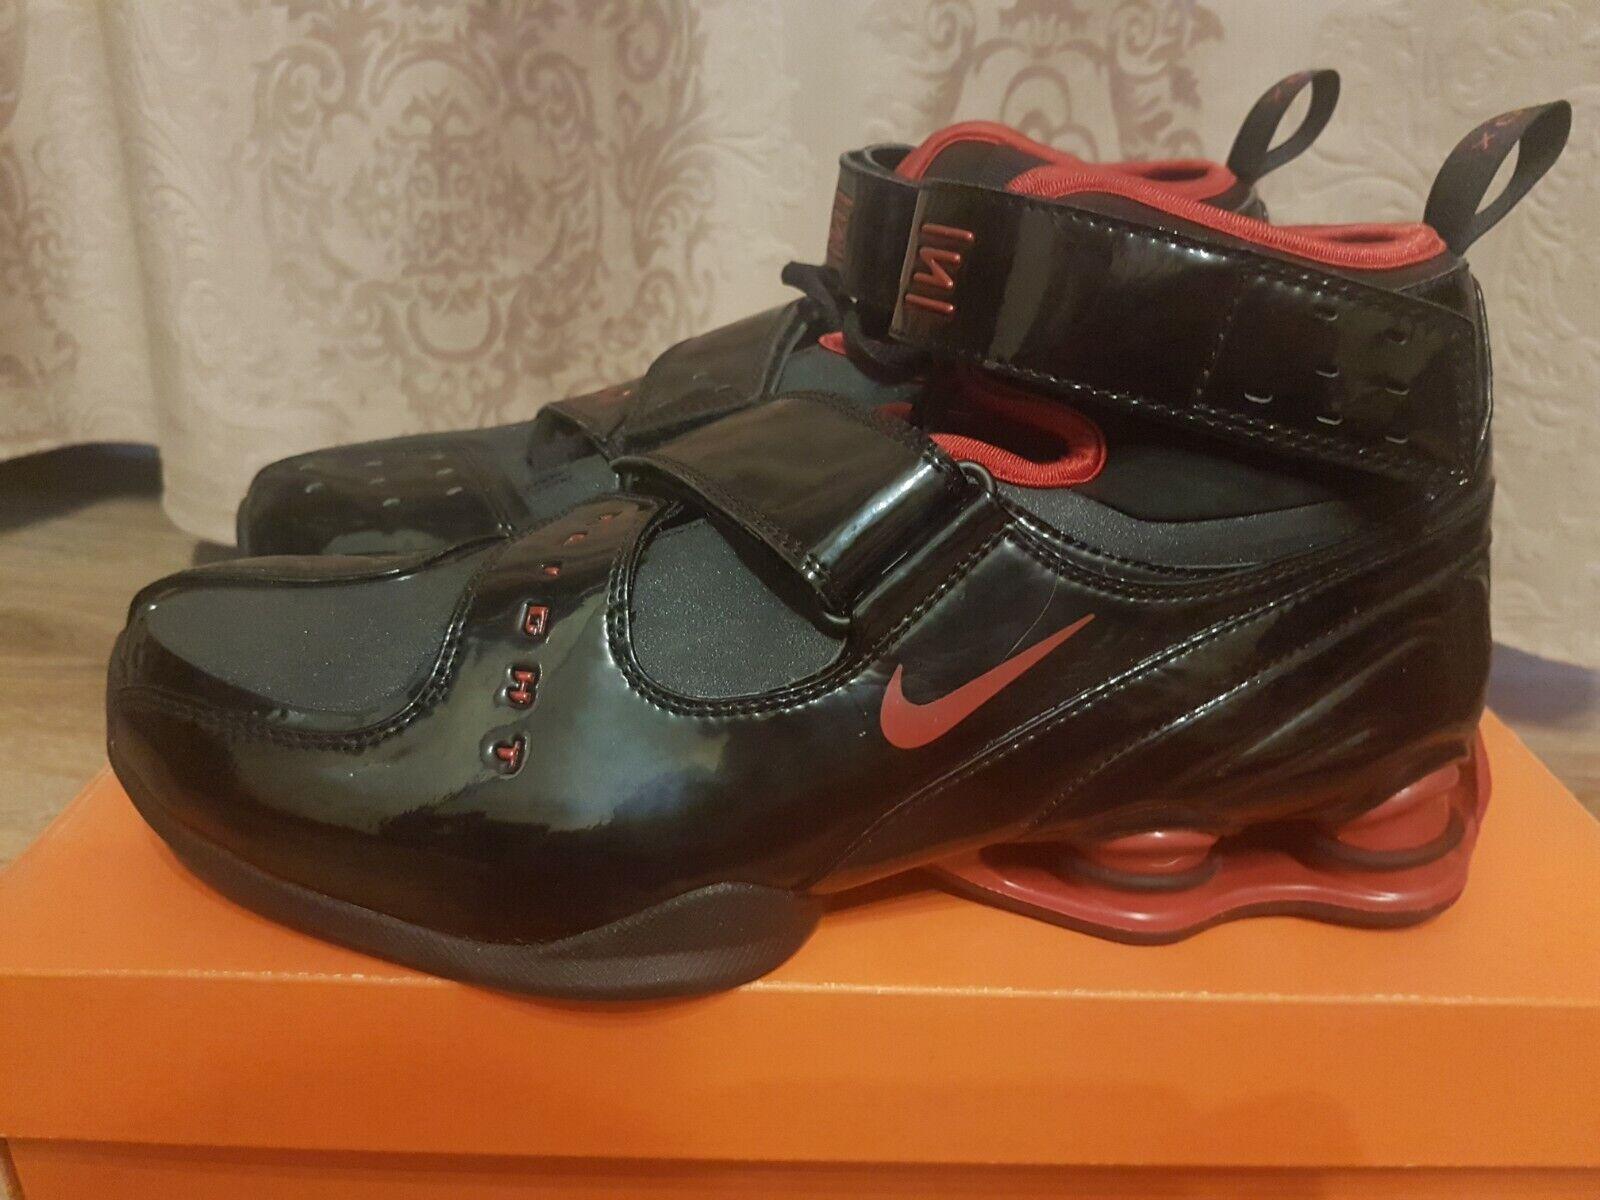 Nike Shox Optimal Shawn Marion PE Baskeball shoes size 10